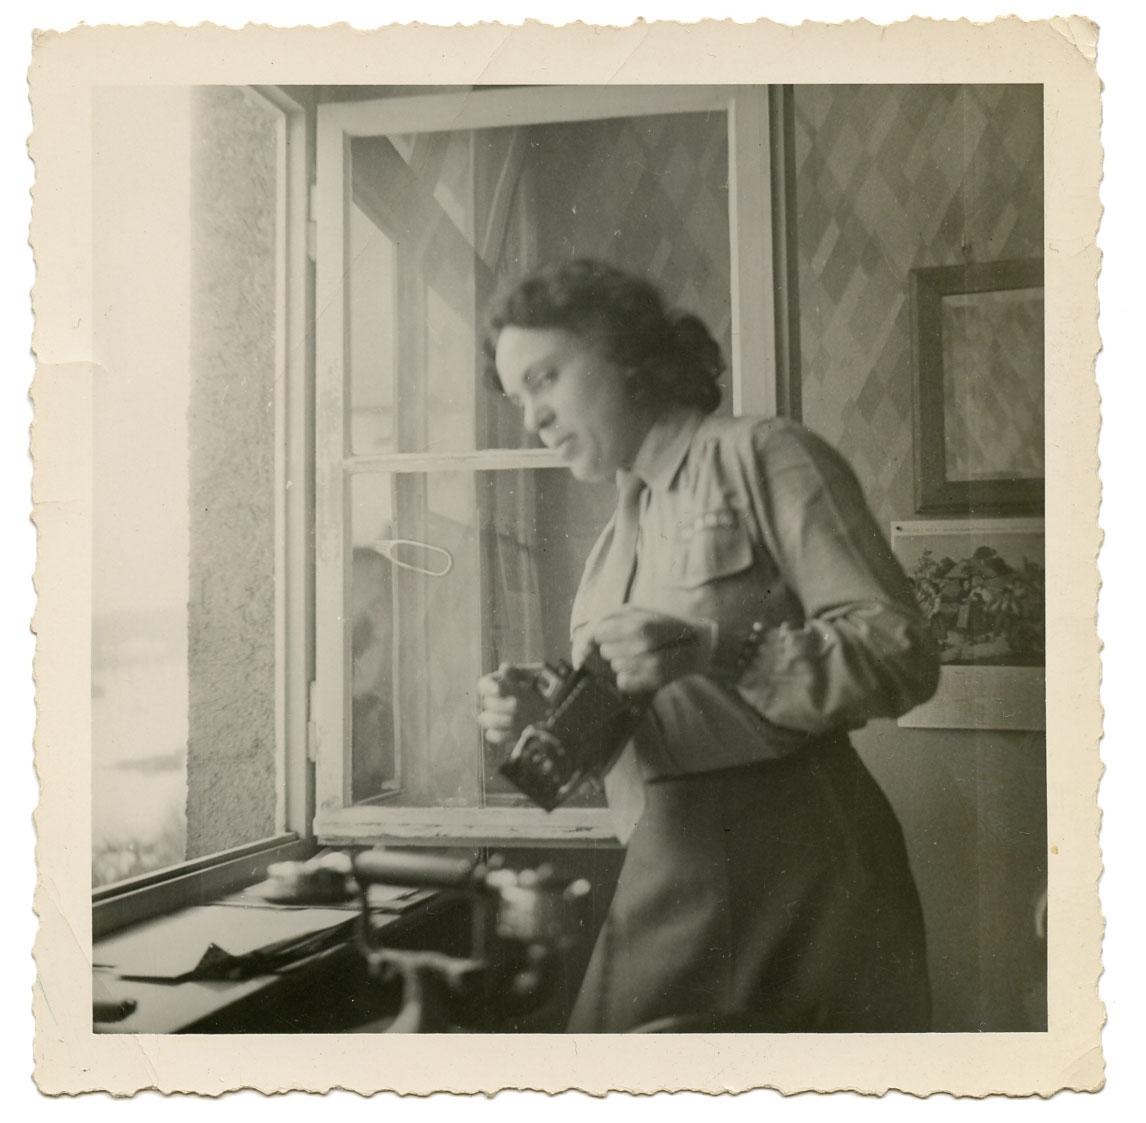 "Uniformed woman & camera. B&W print, undated, 3.5"" x 3.5"" Found in Philadelphia, PA"